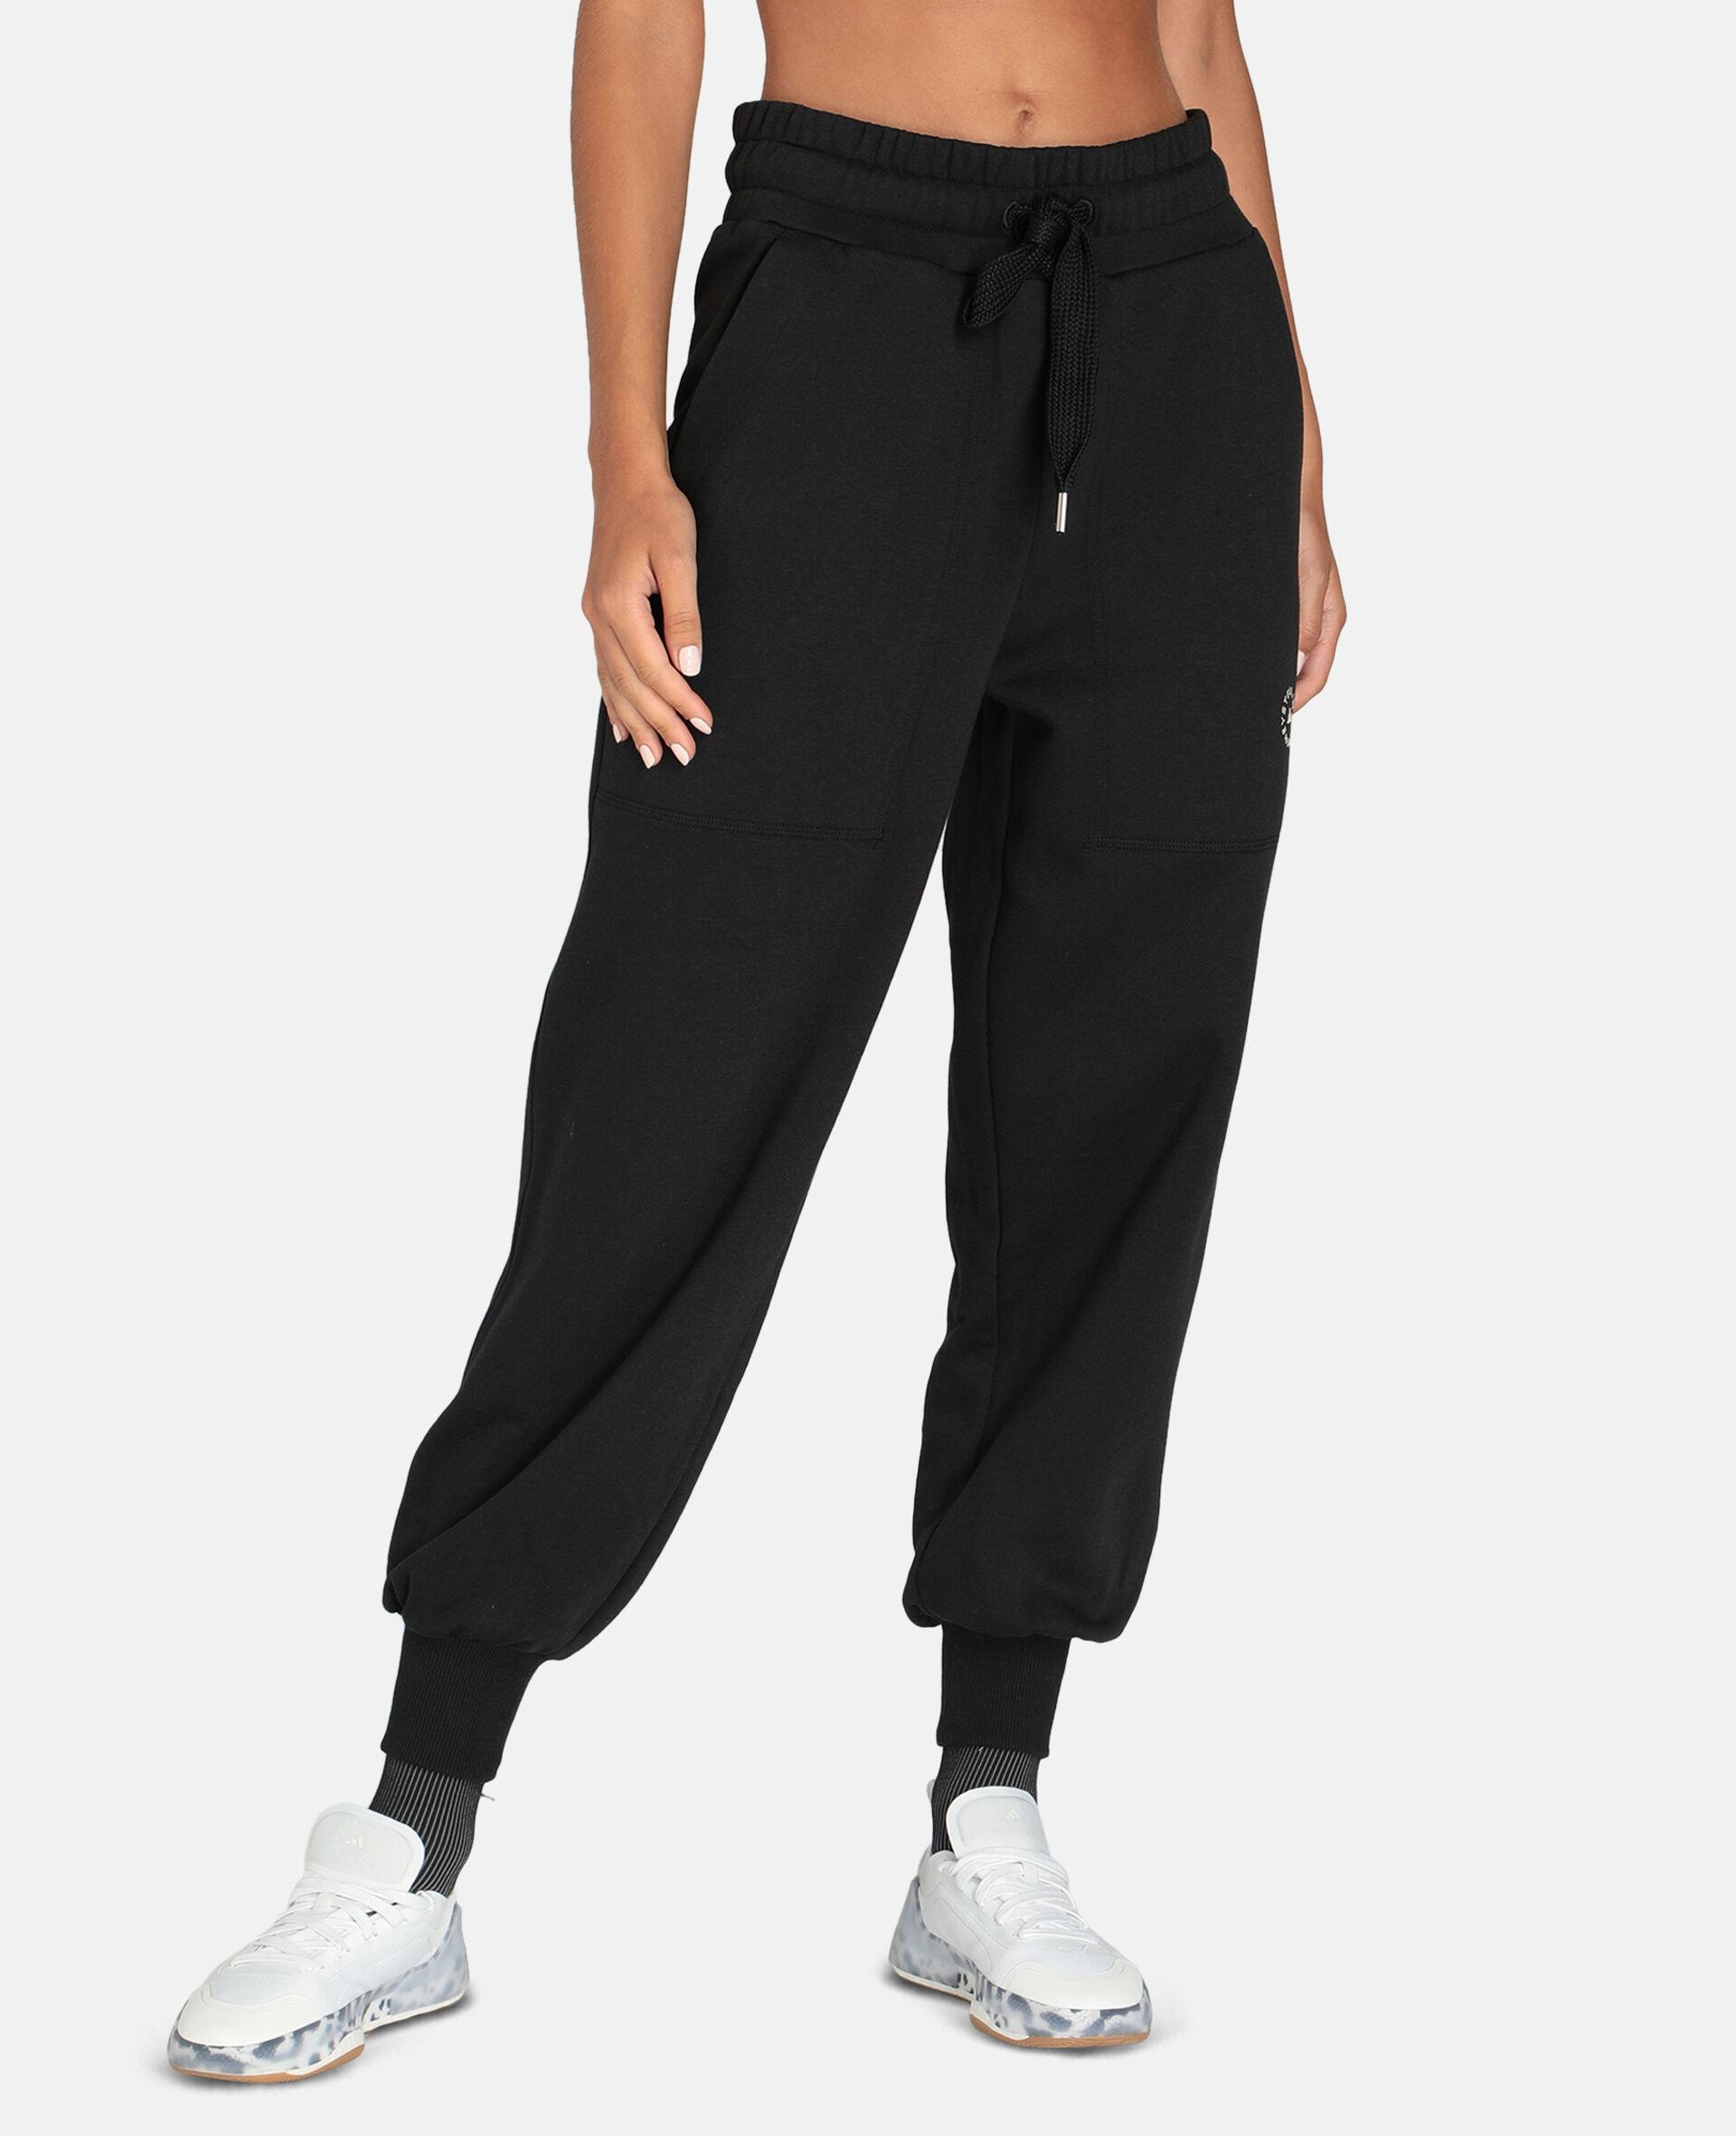 Gray Training Sweatpants-Black-large image number 4